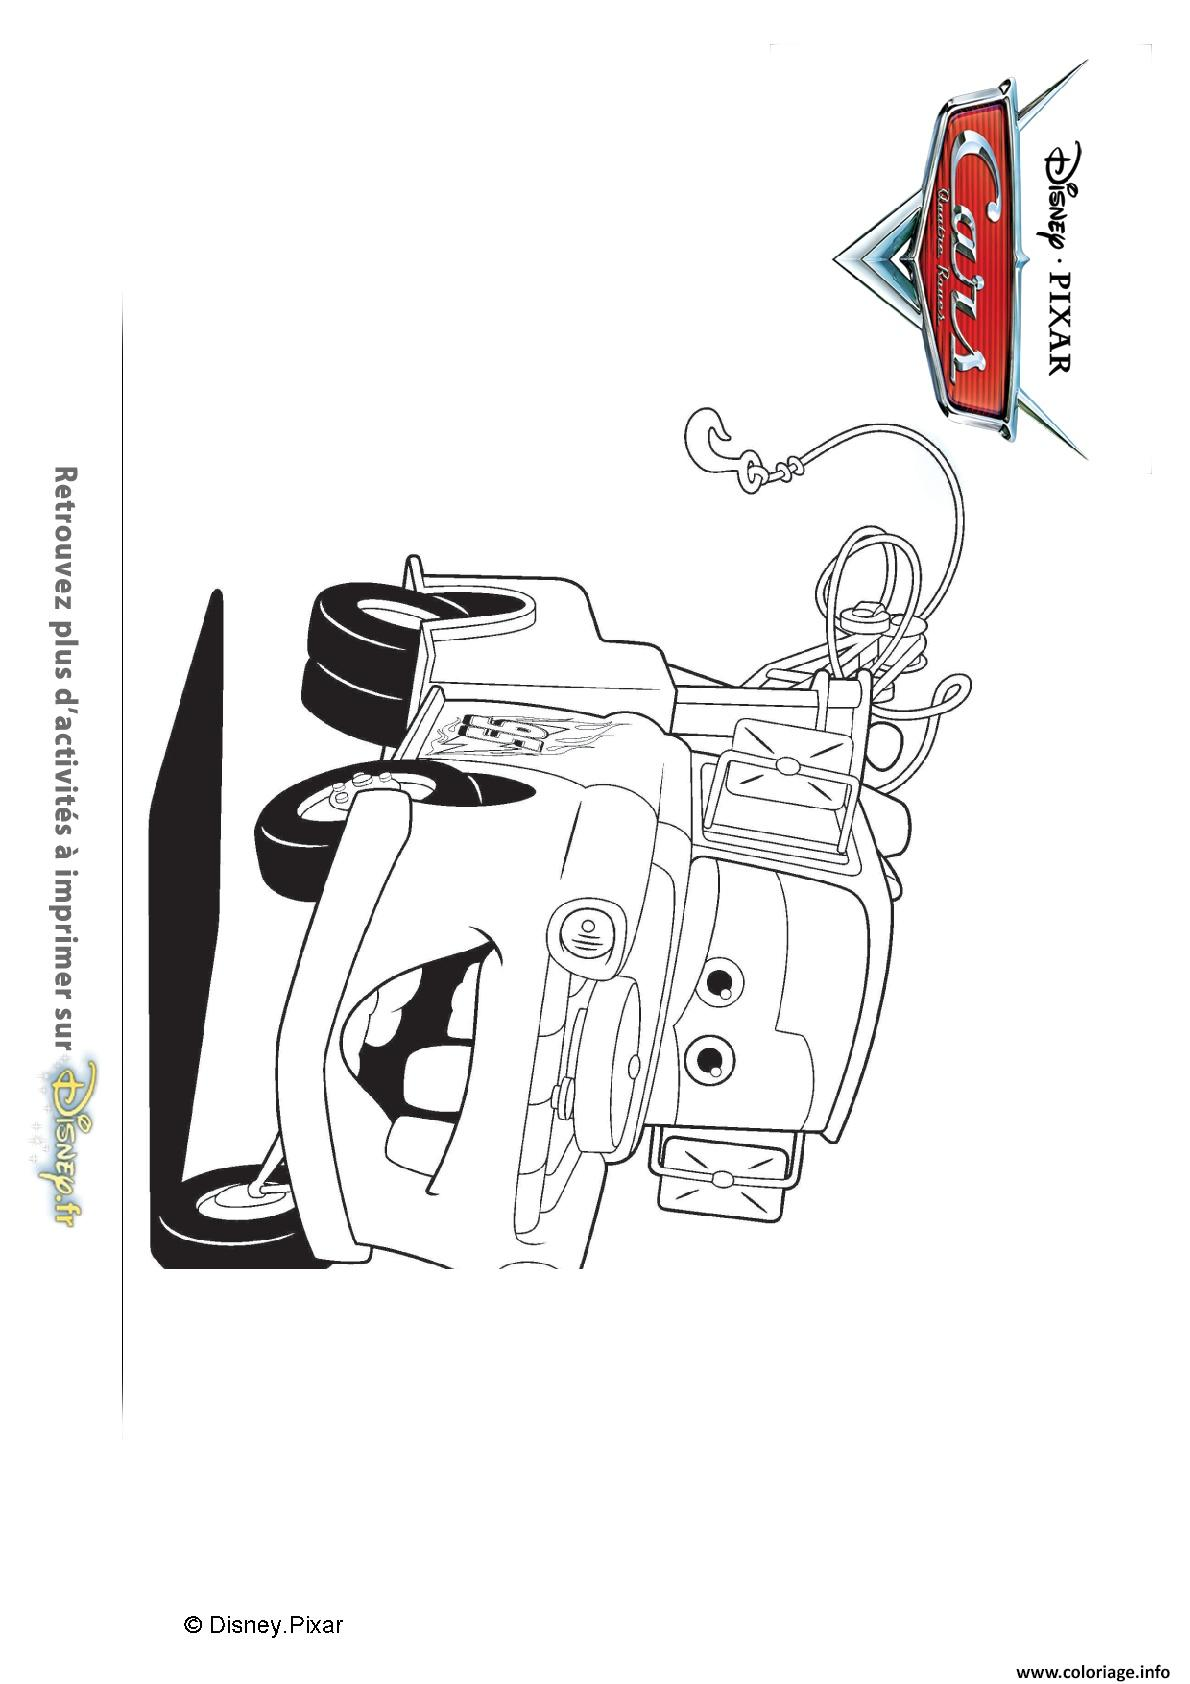 Coloriage martin fidele depanneuse rouillee cars disney dessin - Depanneuse cars ...